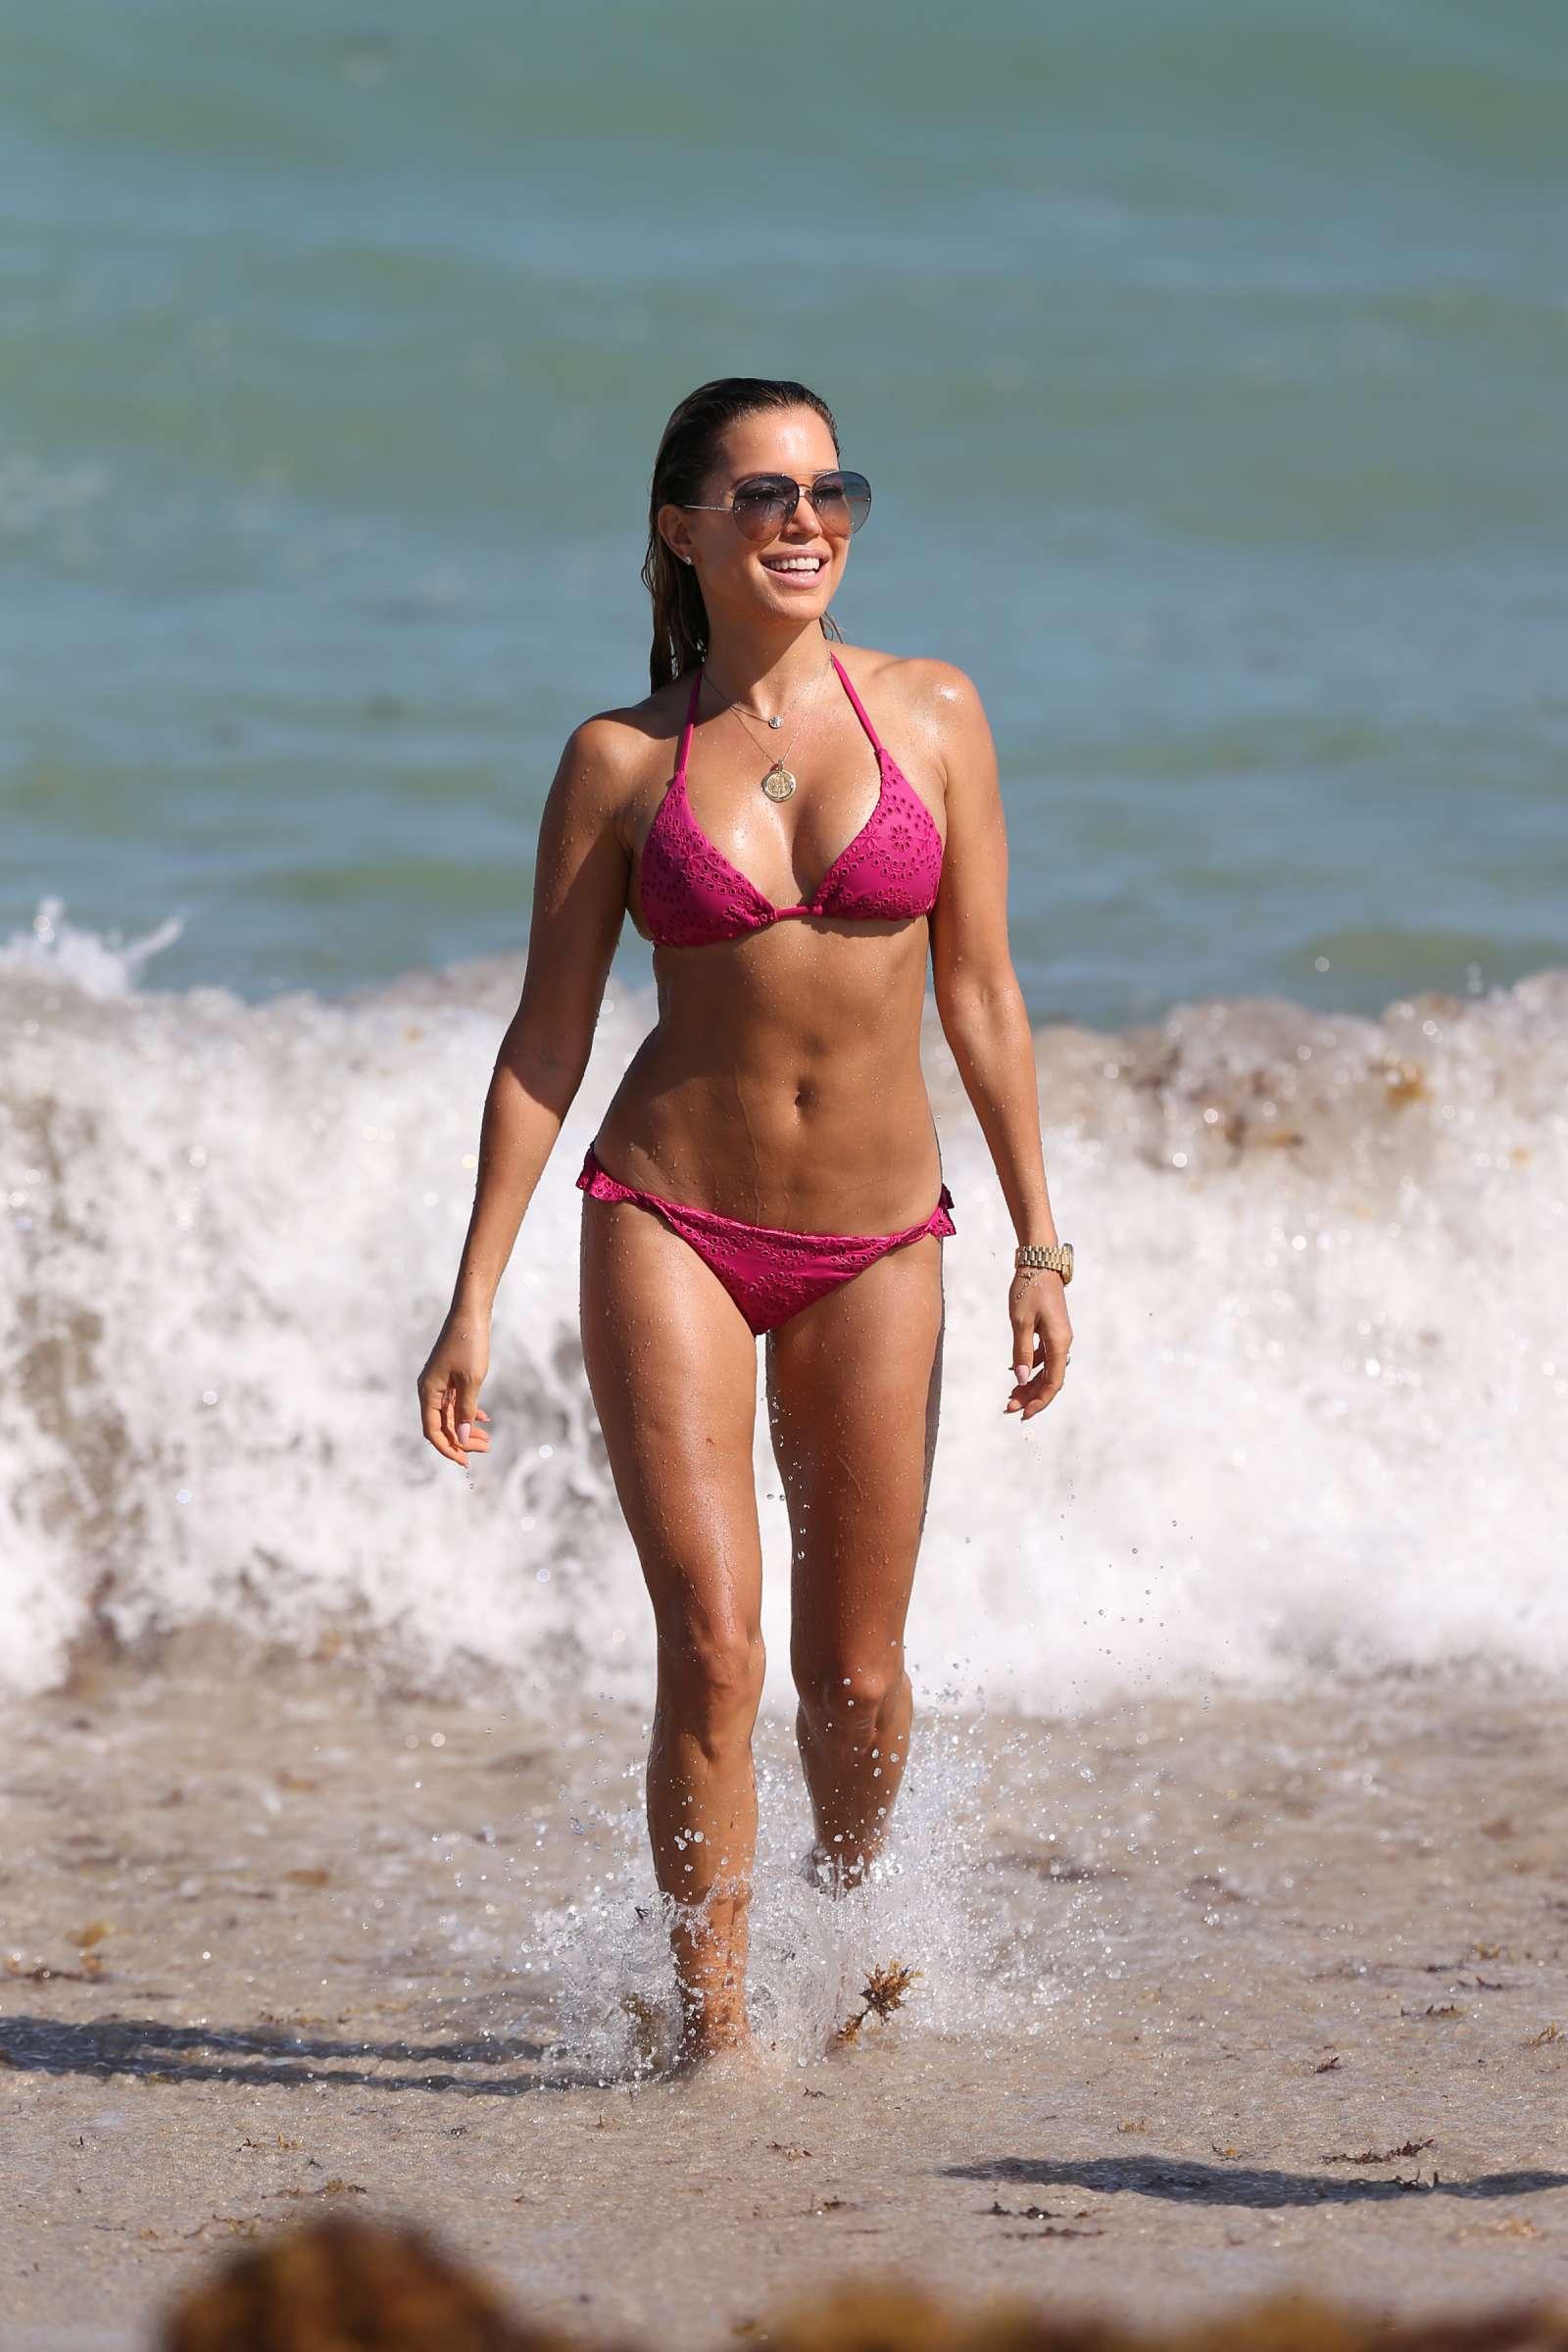 Sylvie Meis 2018 : Sylvie Meis in Pink Bikini 2018 -06